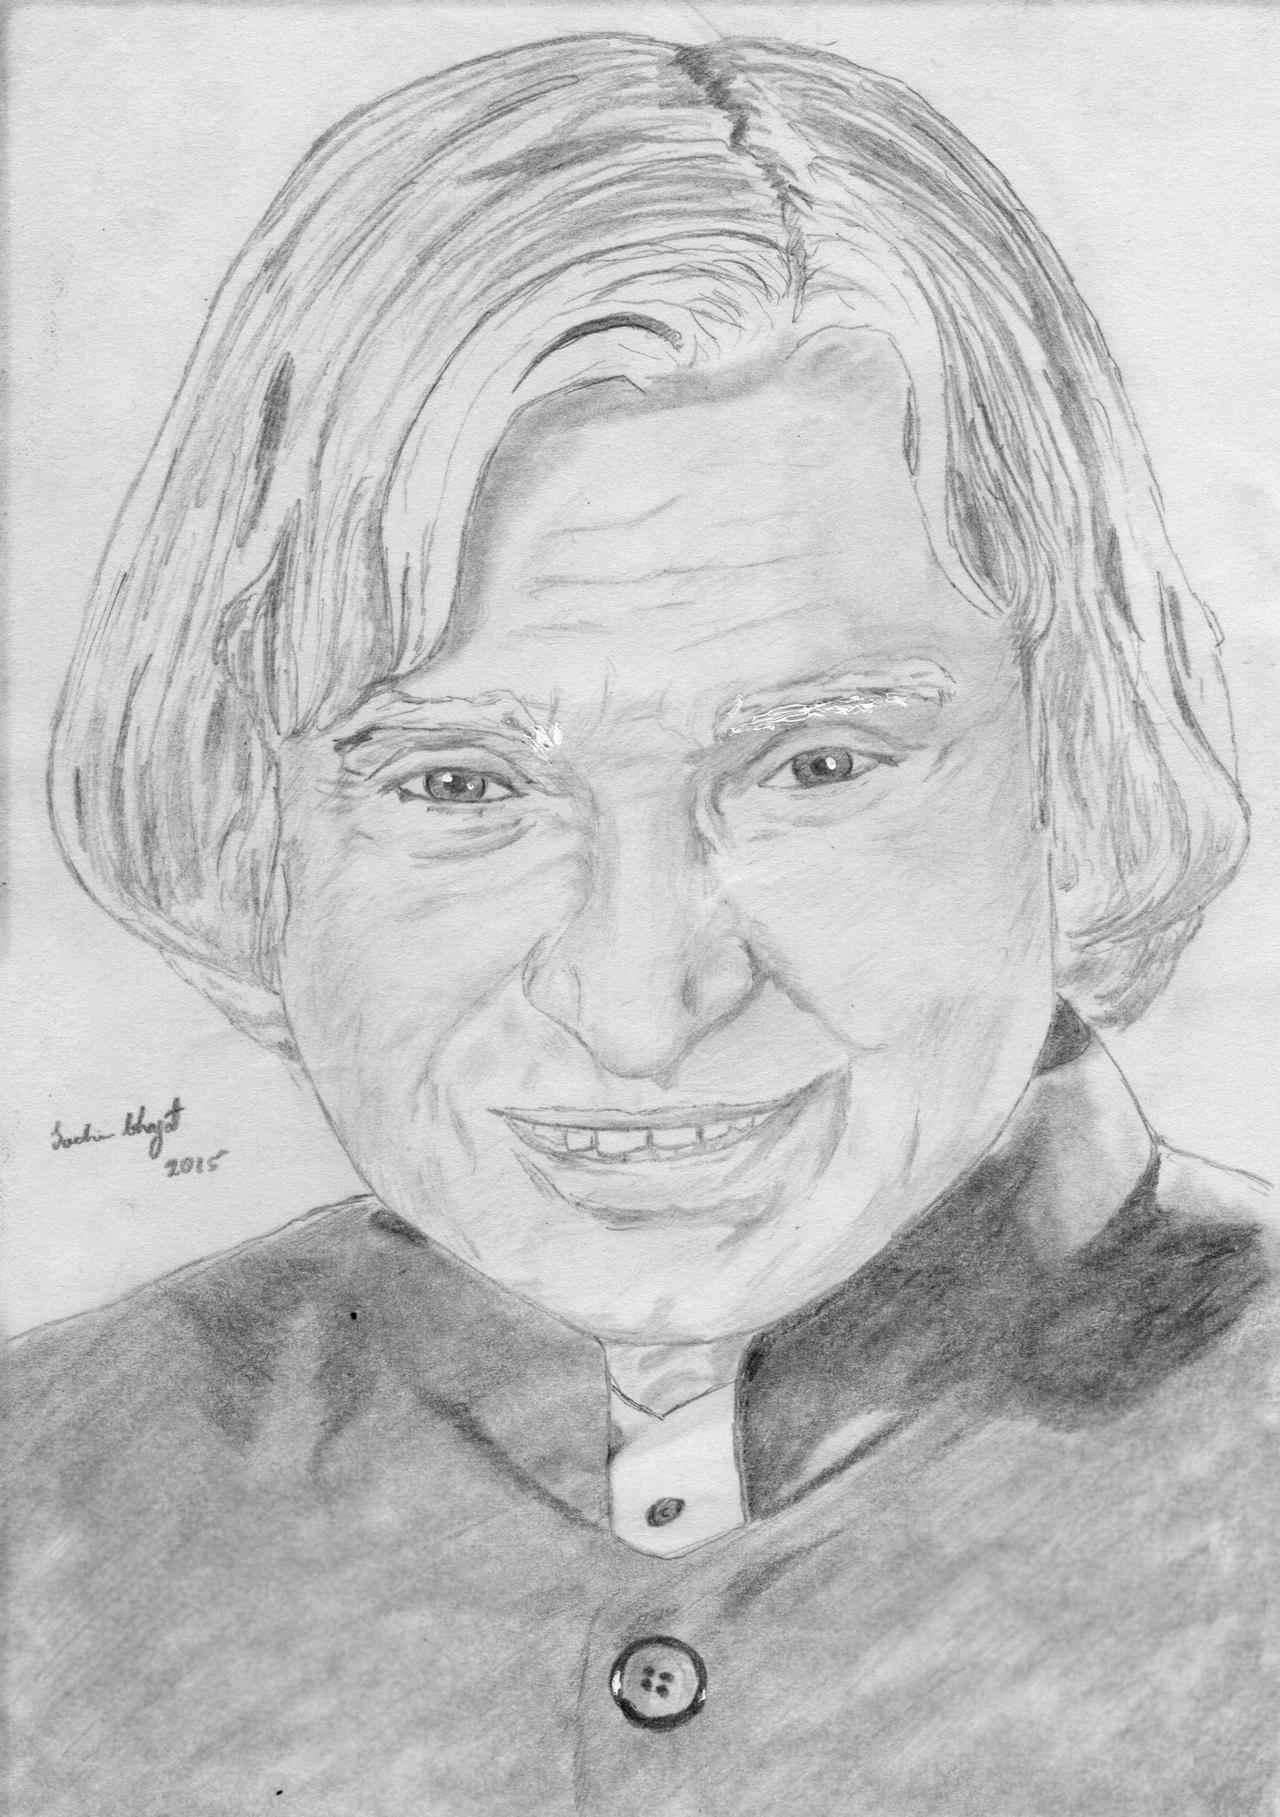 A.P.J Abdul Kalam Pencil Sketch by Sachin-Bhagat on DeviantArt